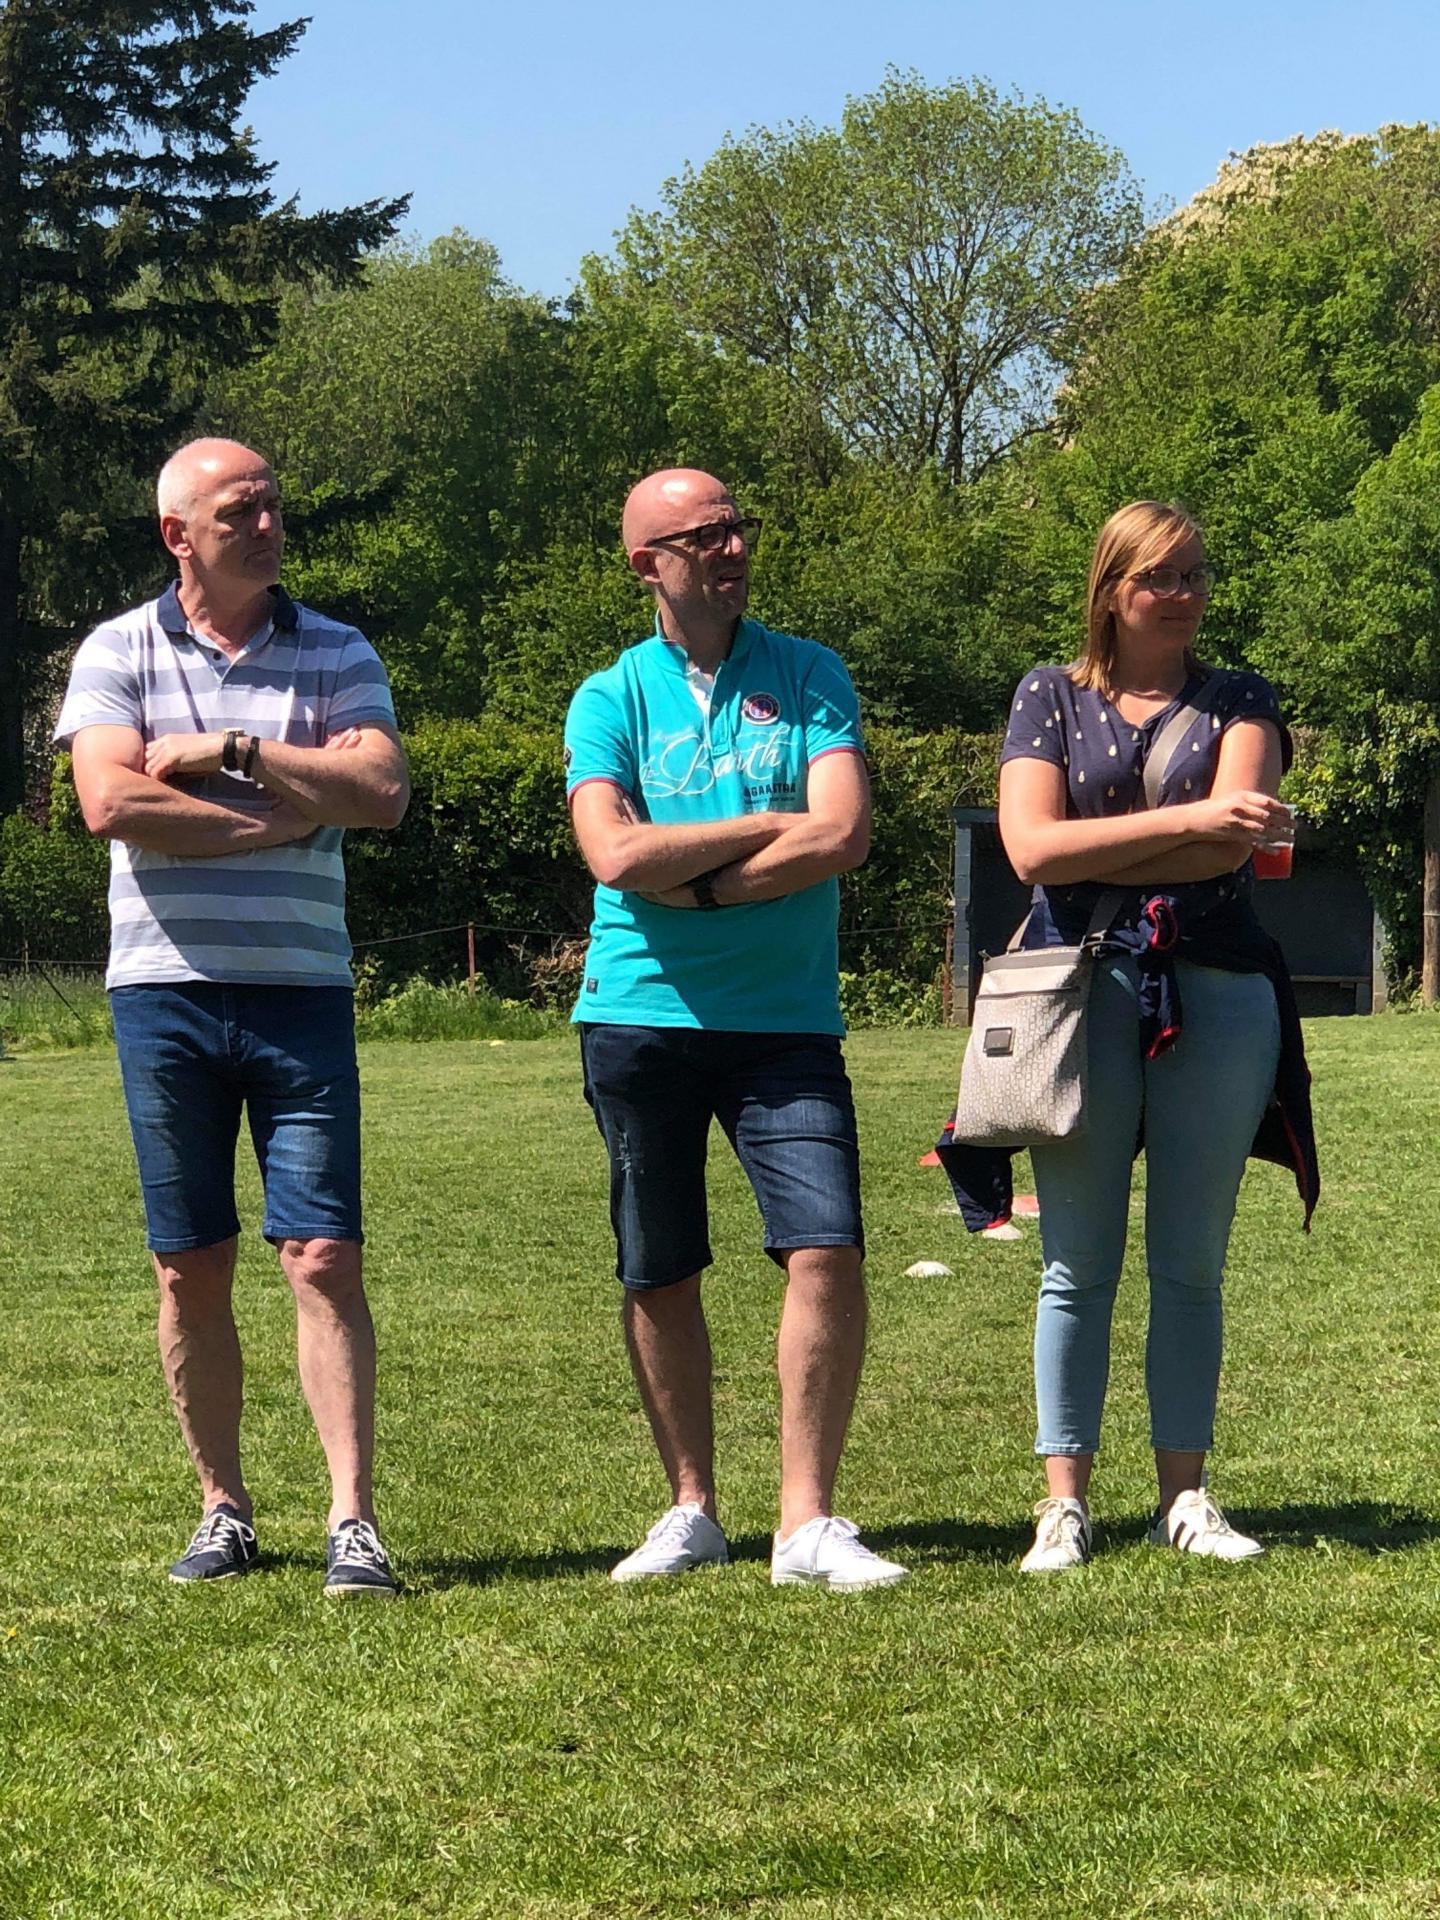 Tournoi de foot de Ragnies 2018